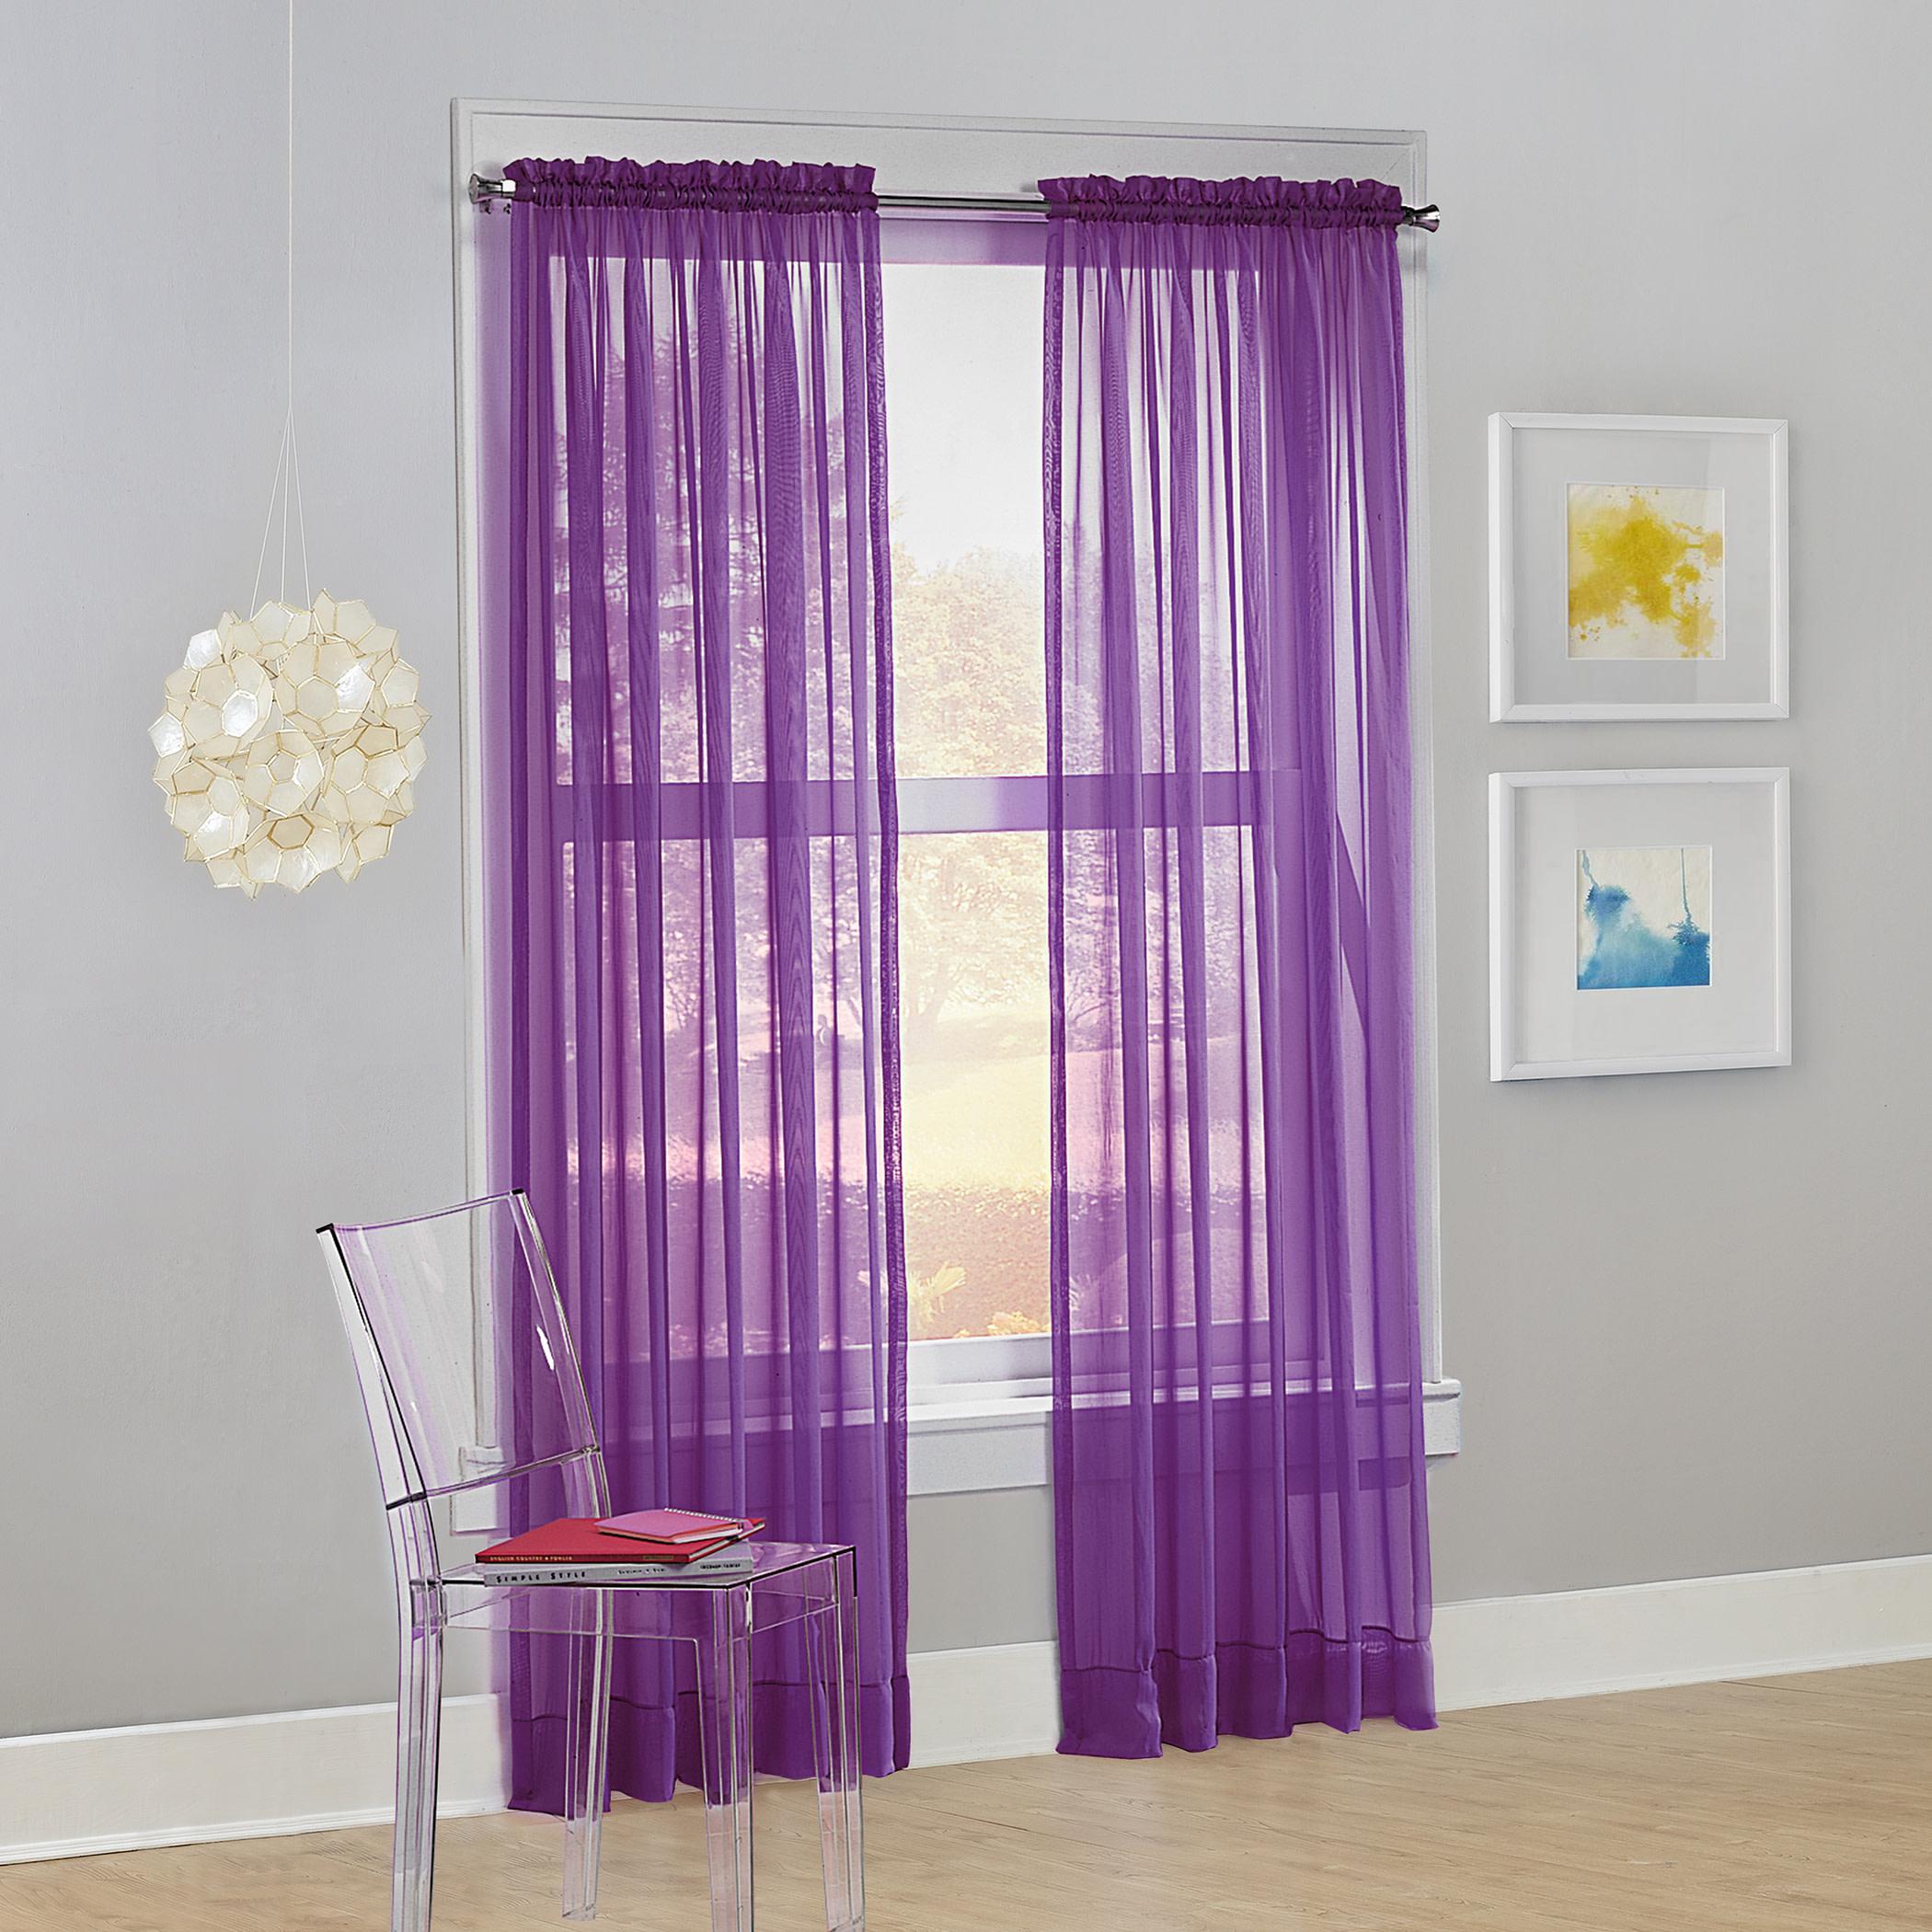 No. 918 Siren Voile Sheer Rod Pocket Curtain Panel